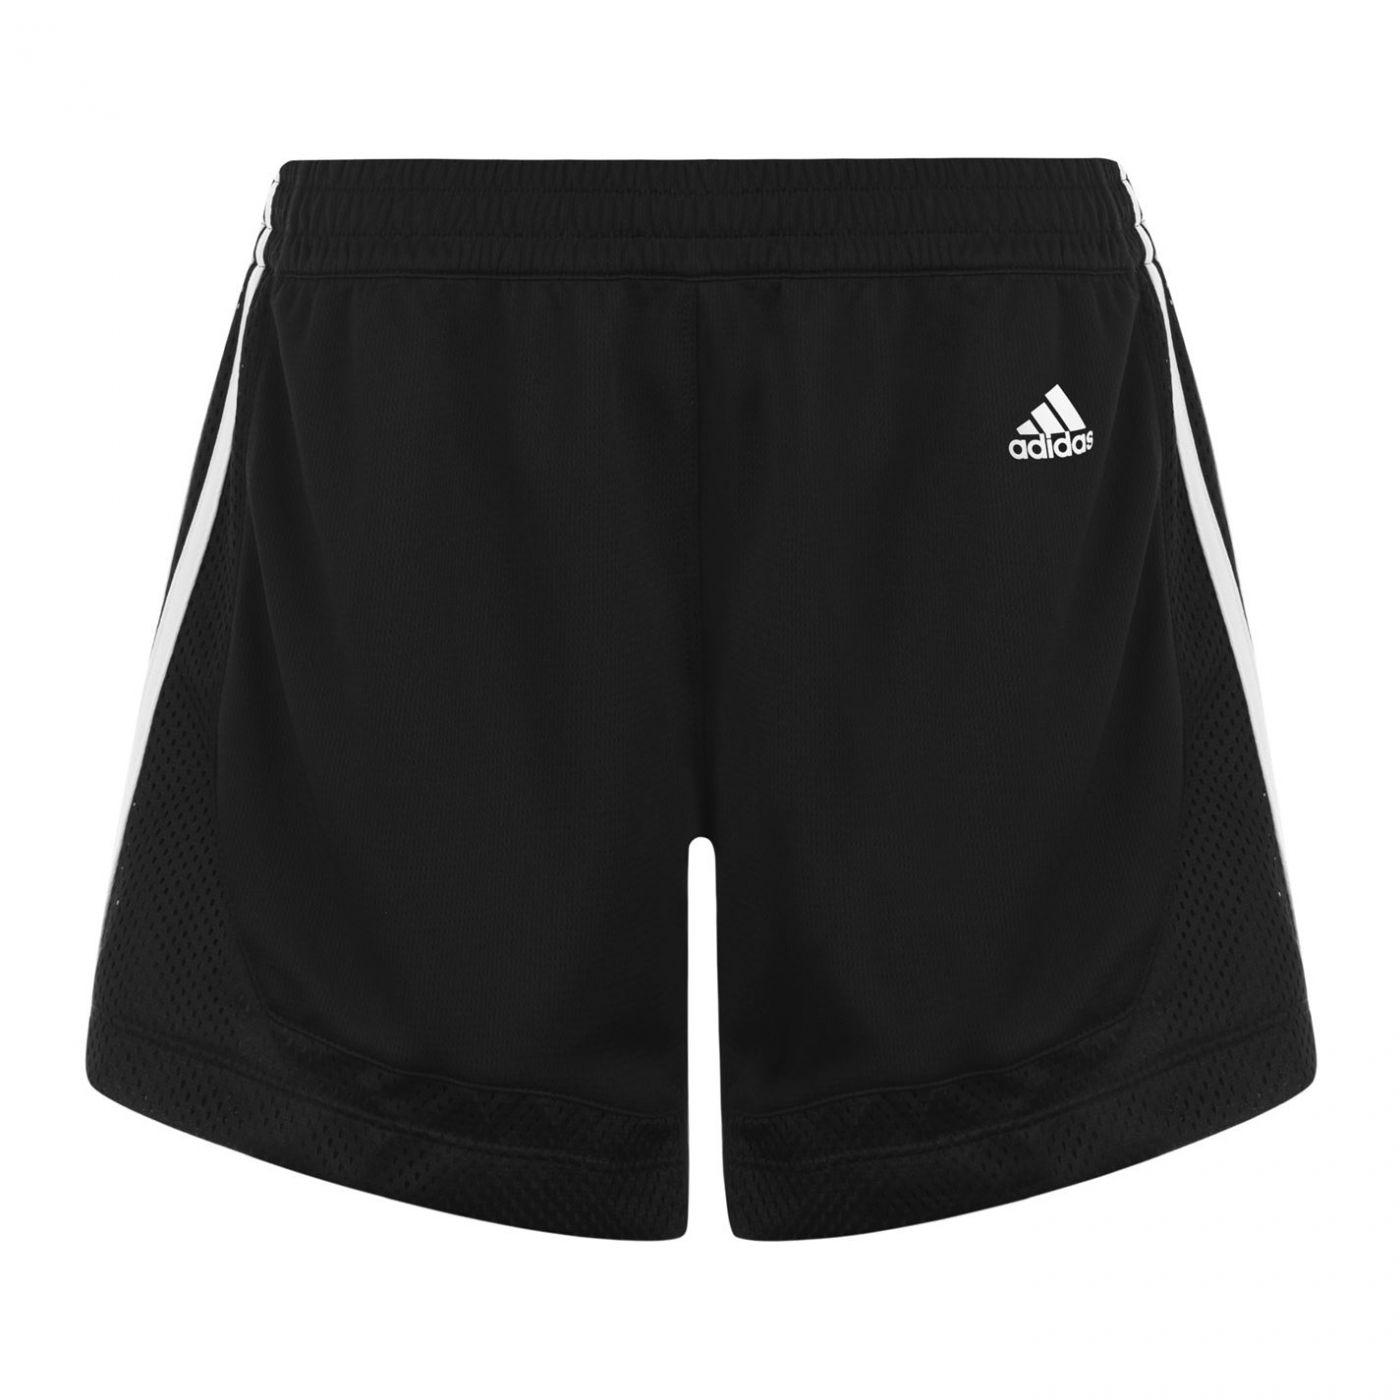 Adidas 3S Mesh Short Ld94